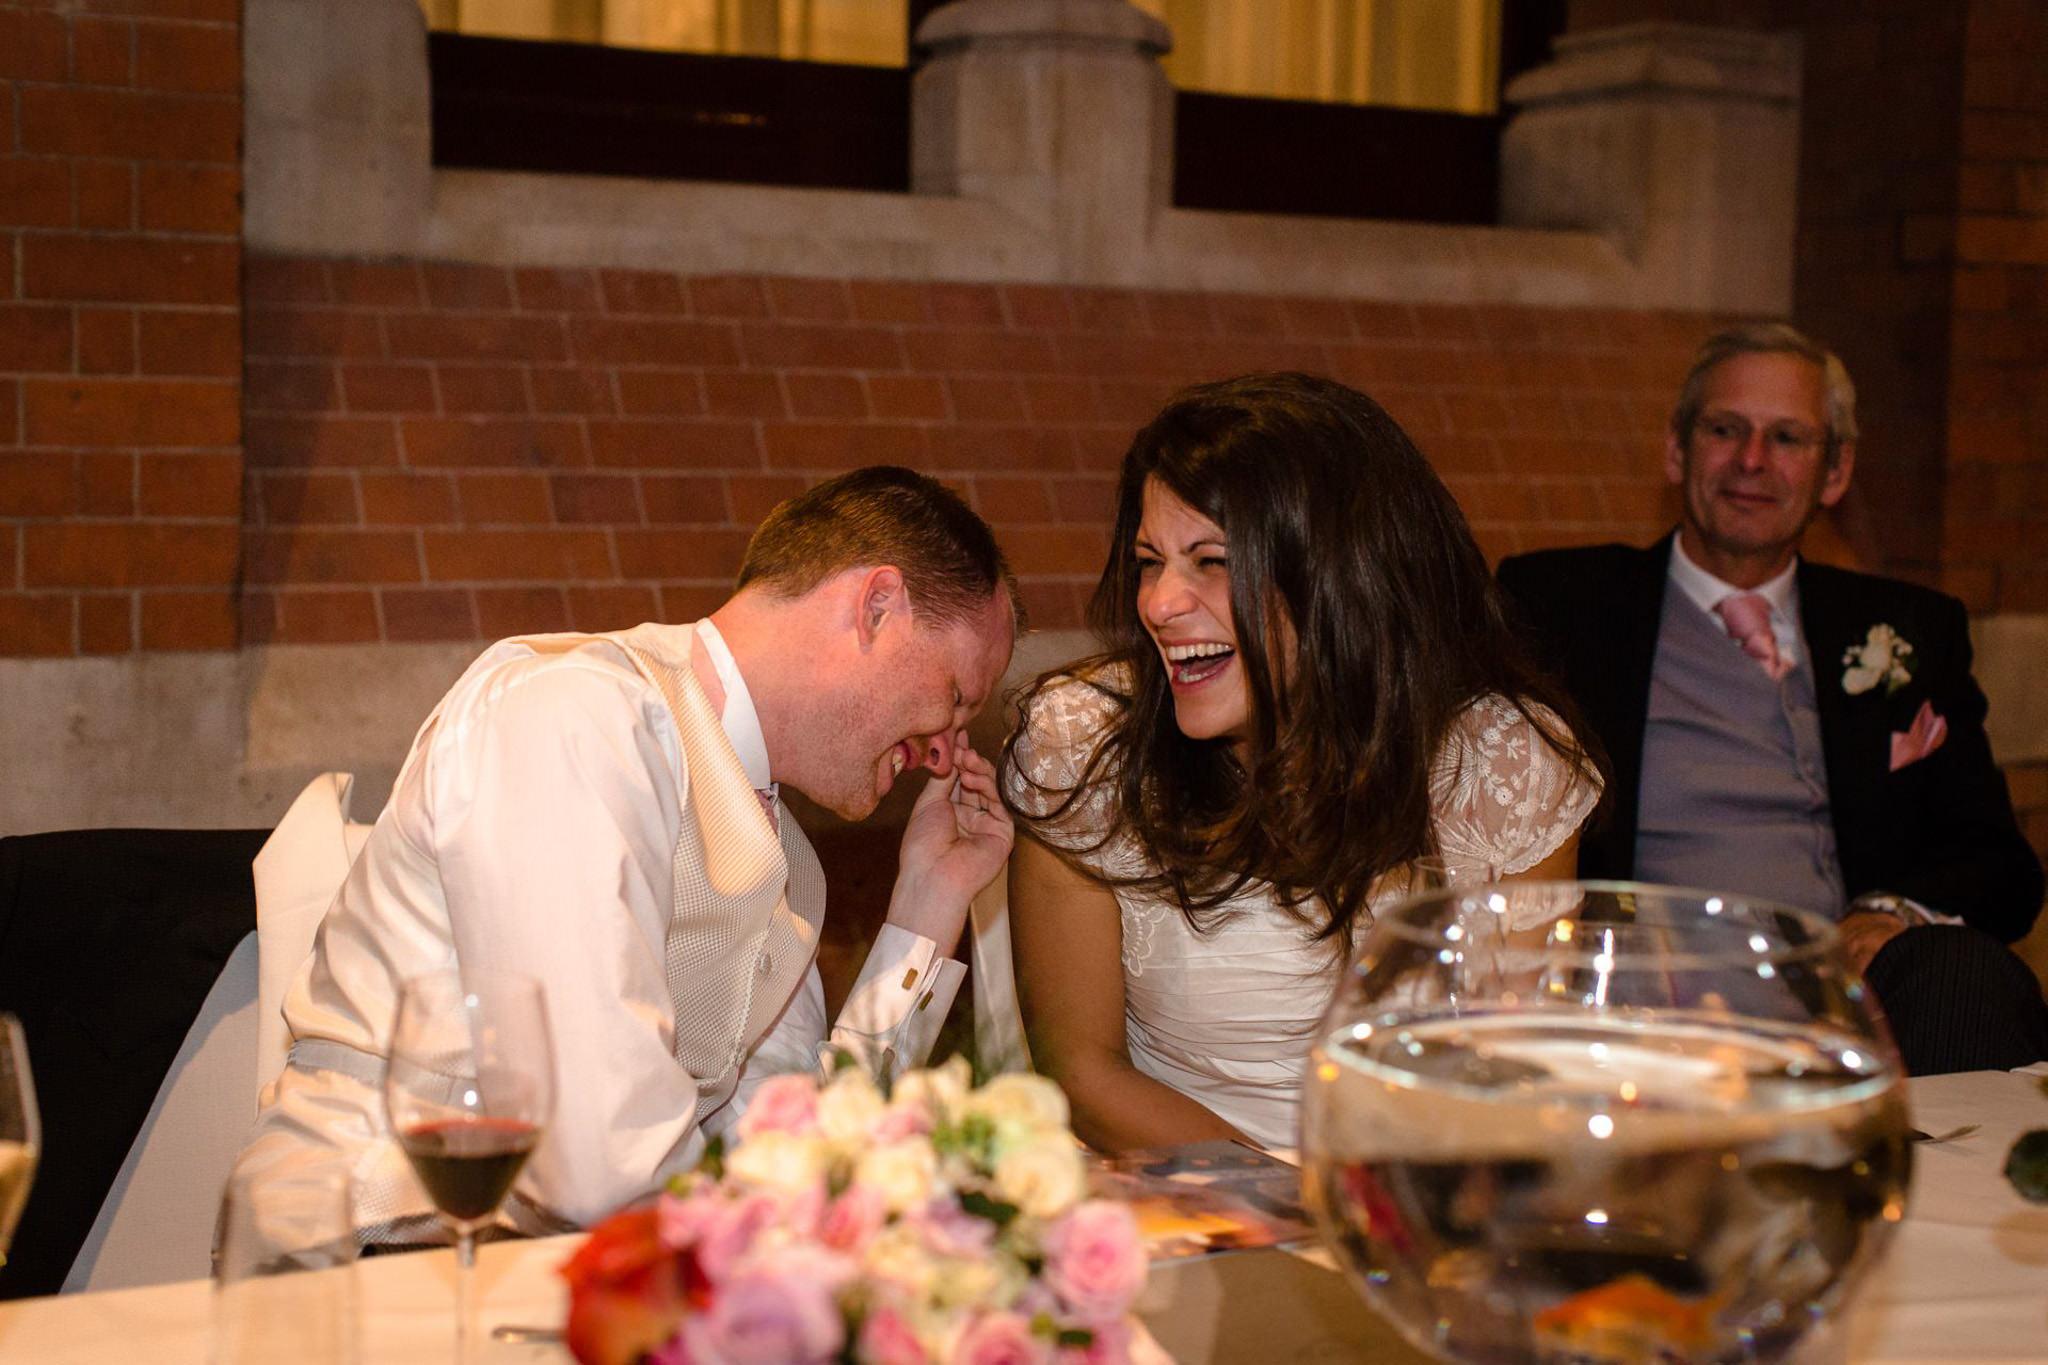 St. Pancras hotel wedding couple reaction